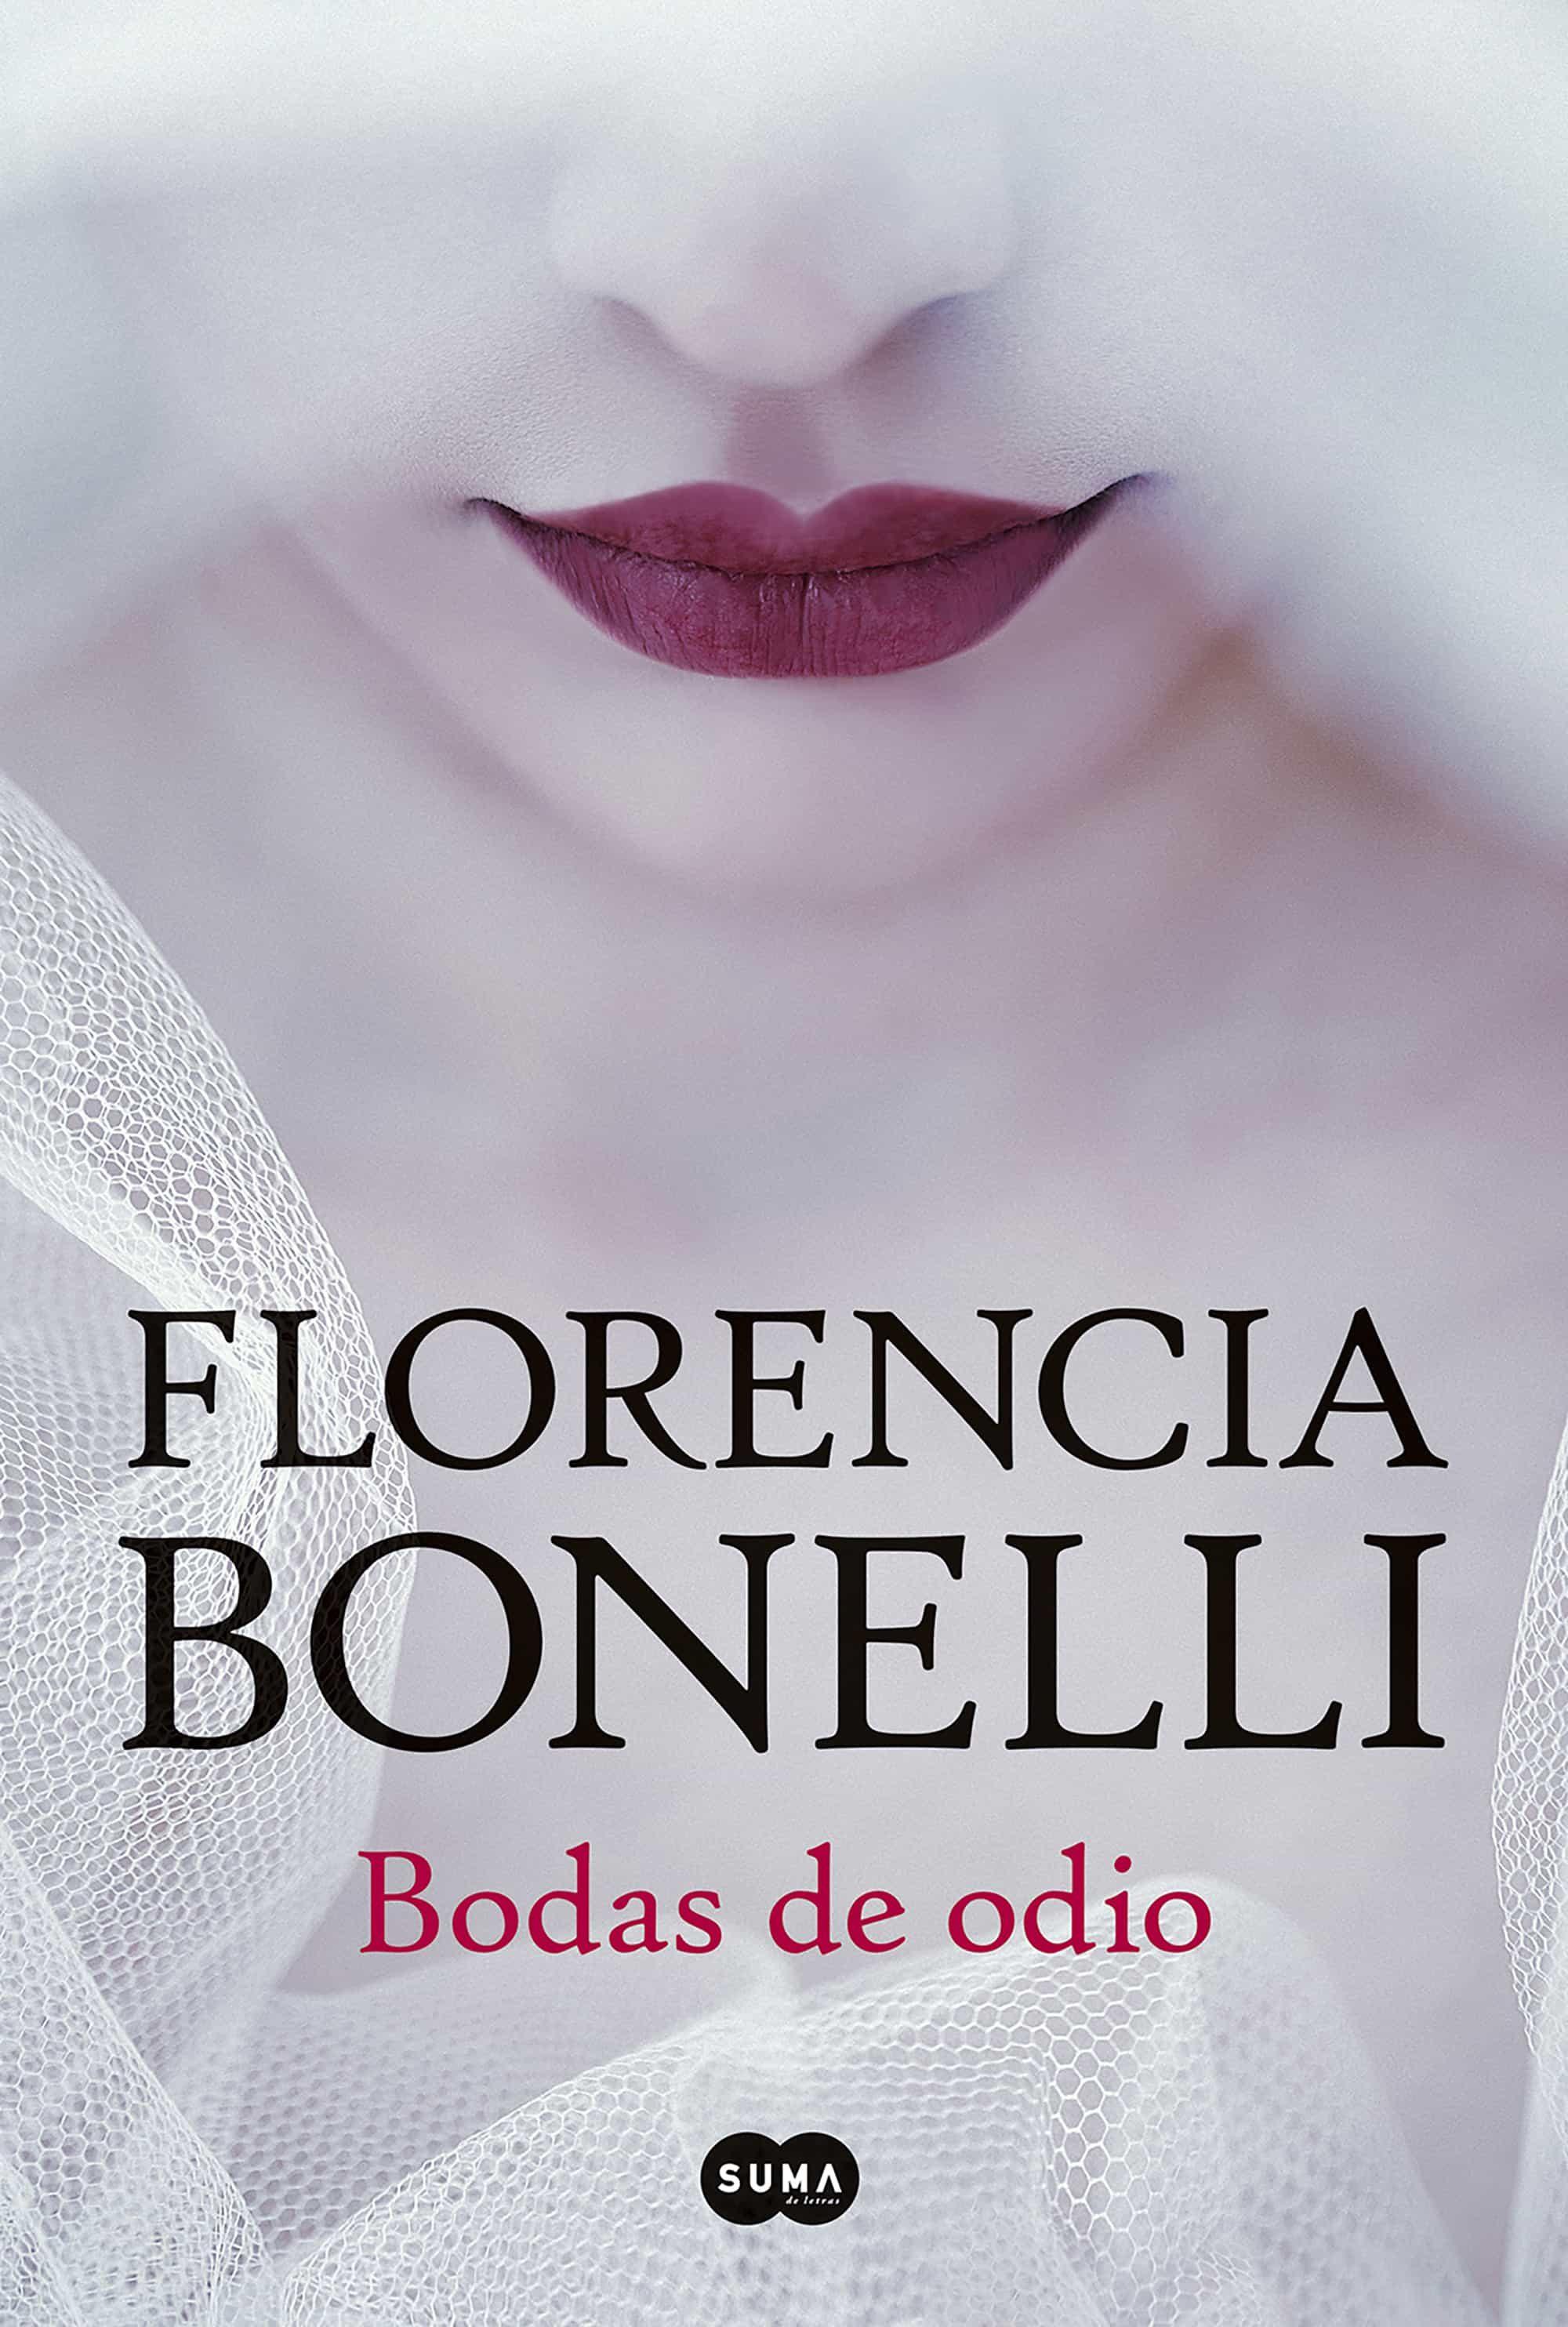 bodas de odio (ebook),florencia bonelli,9789875781788